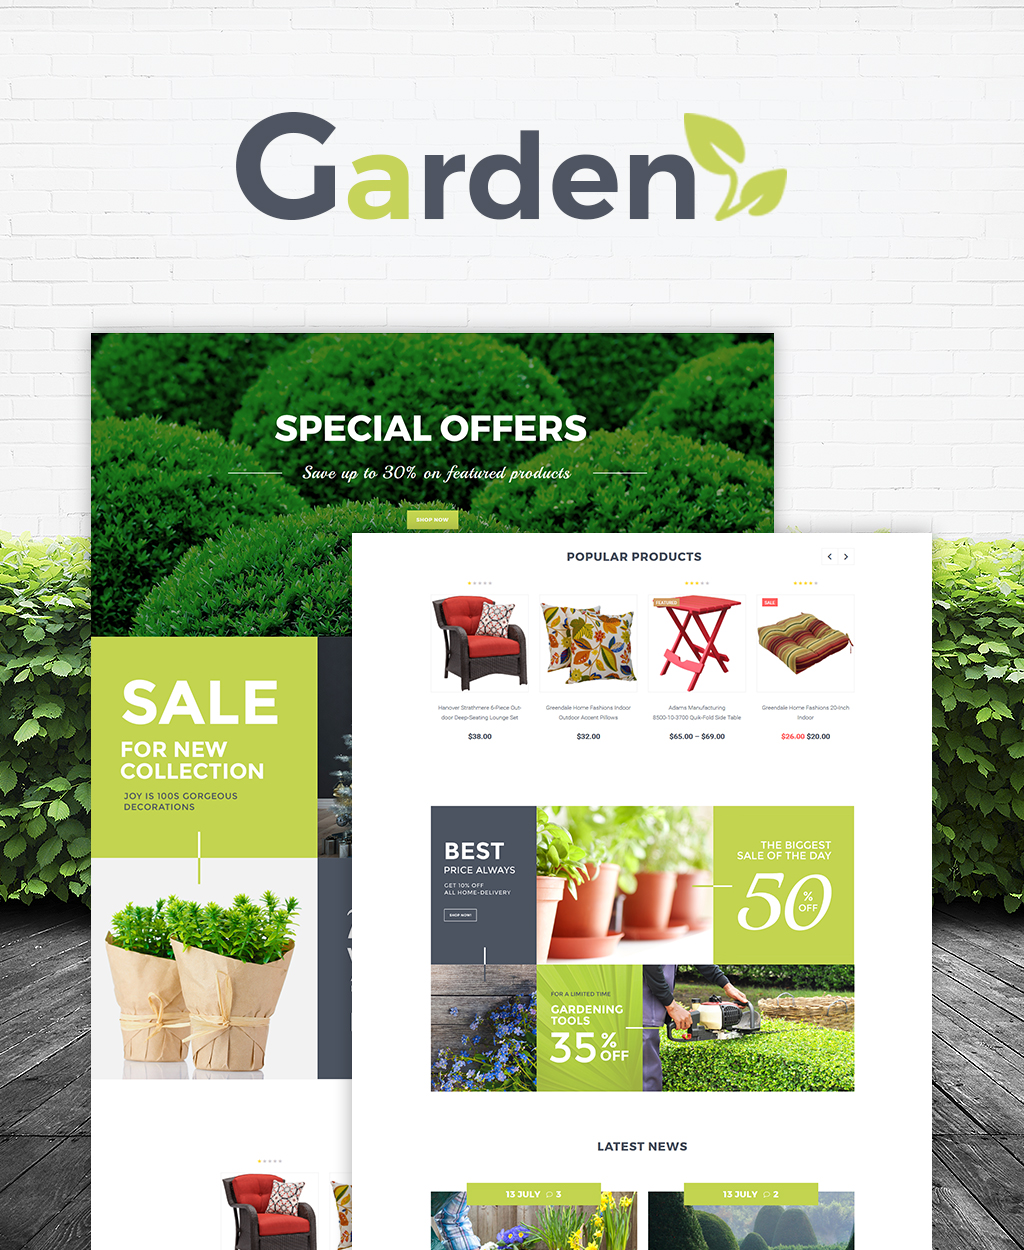 Garden - Garden Centre Woocommerce Theme WooCommerce Theme